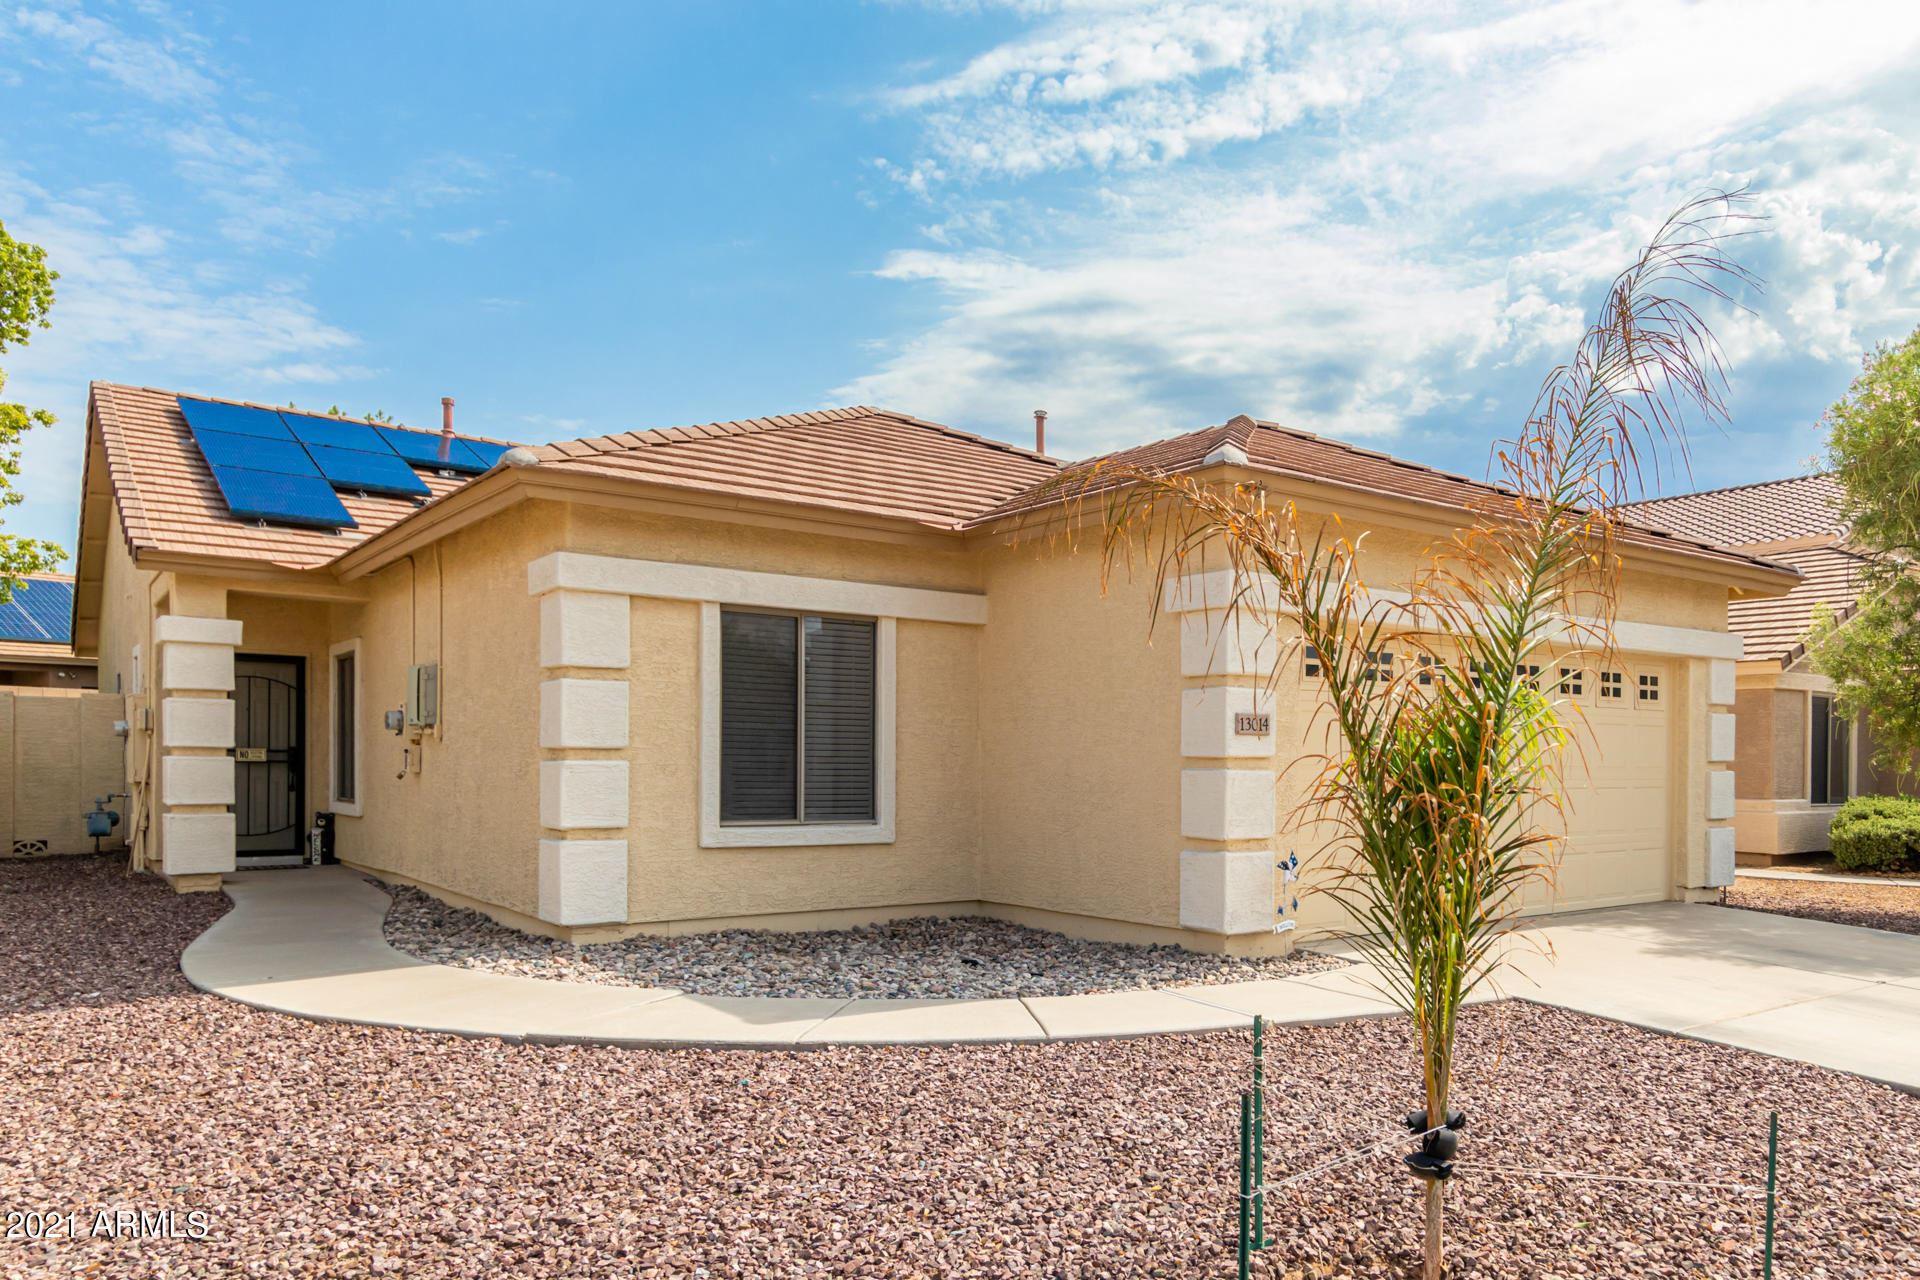 Photo of 13014 W COLUMBINE Drive, El Mirage, AZ 85335 (MLS # 6265879)